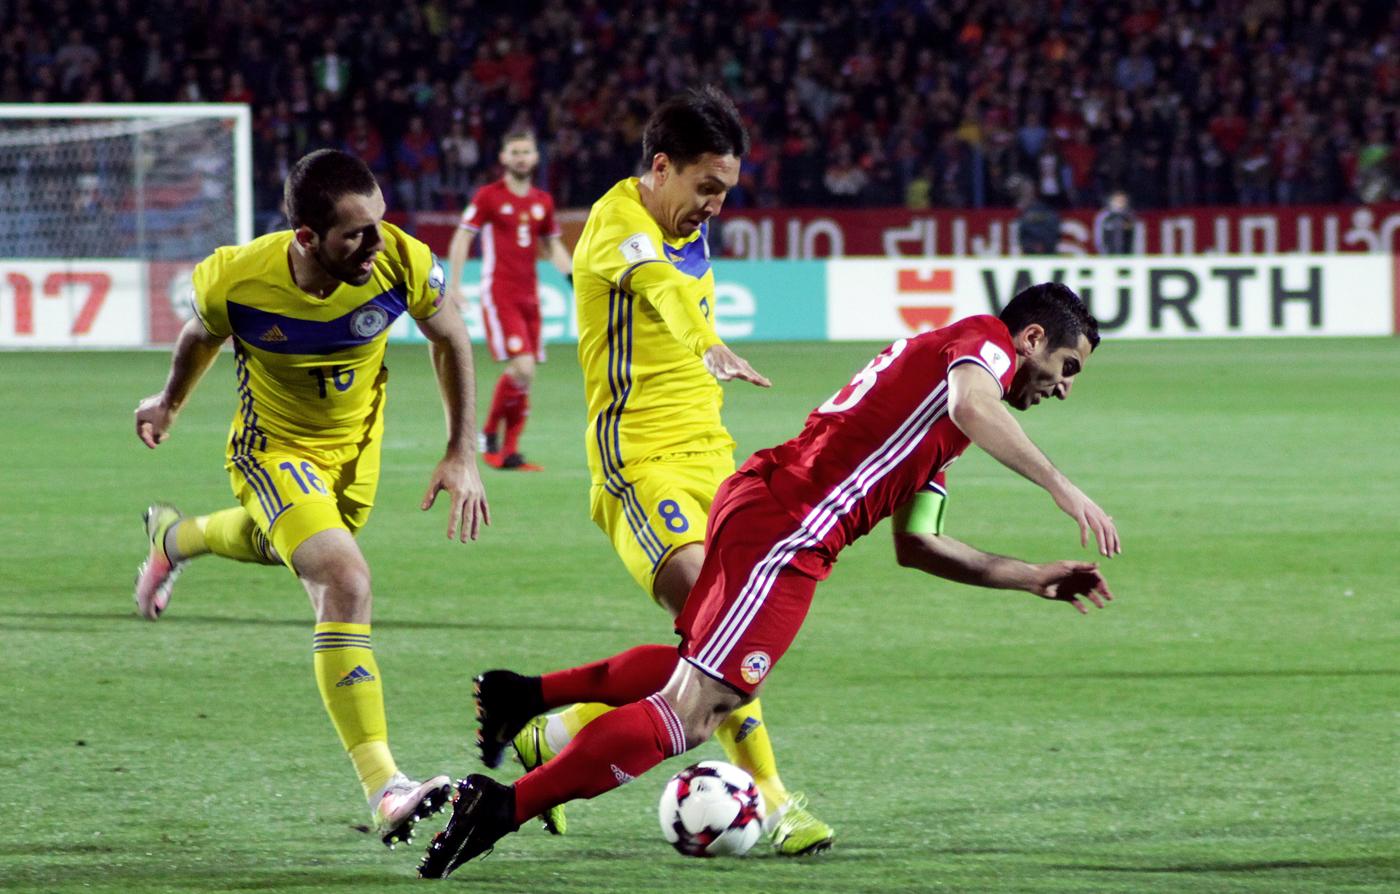 AnnaIMG 6073 - Sports Photography with Talar Kalajian